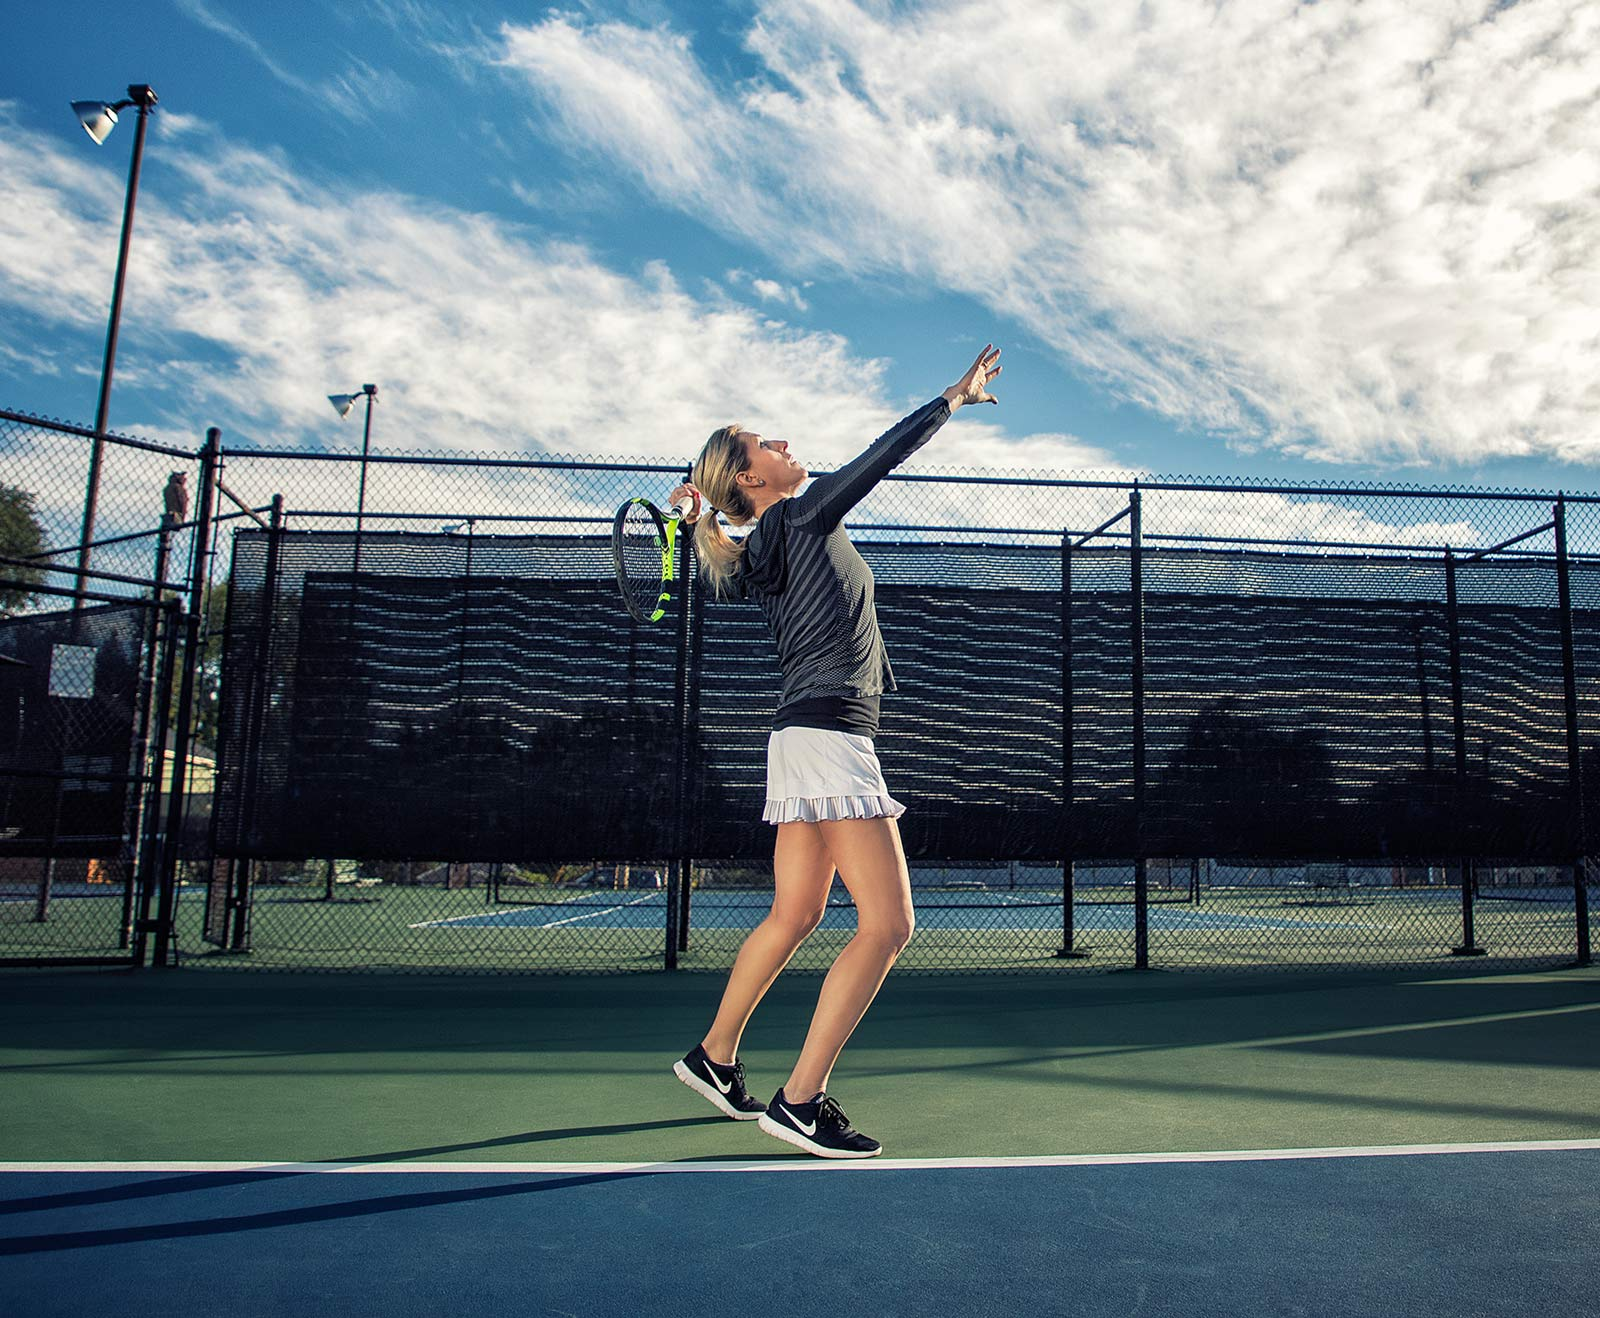 home-kansas-city-health-club-tennis